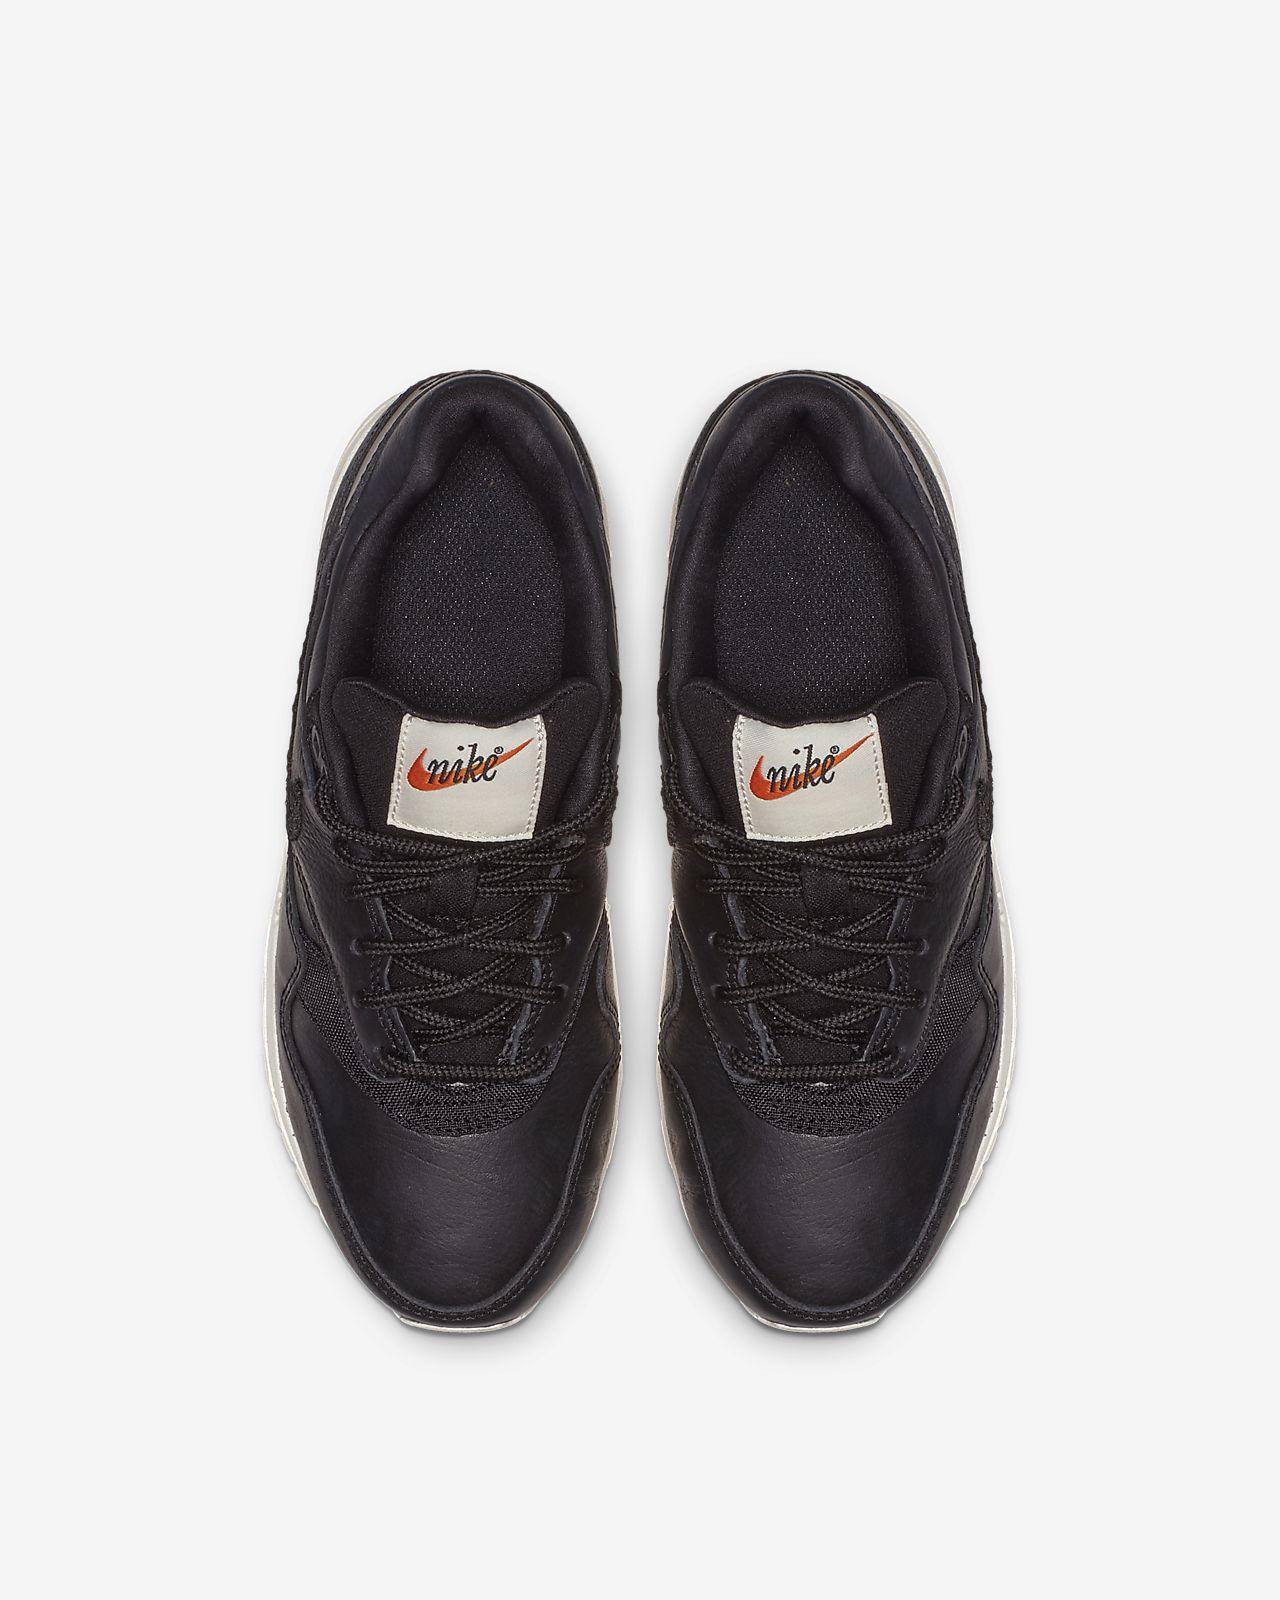 Calzado para niños talla grande Nike Air Max 1 Premium Embroidered ... ba86b9eac502